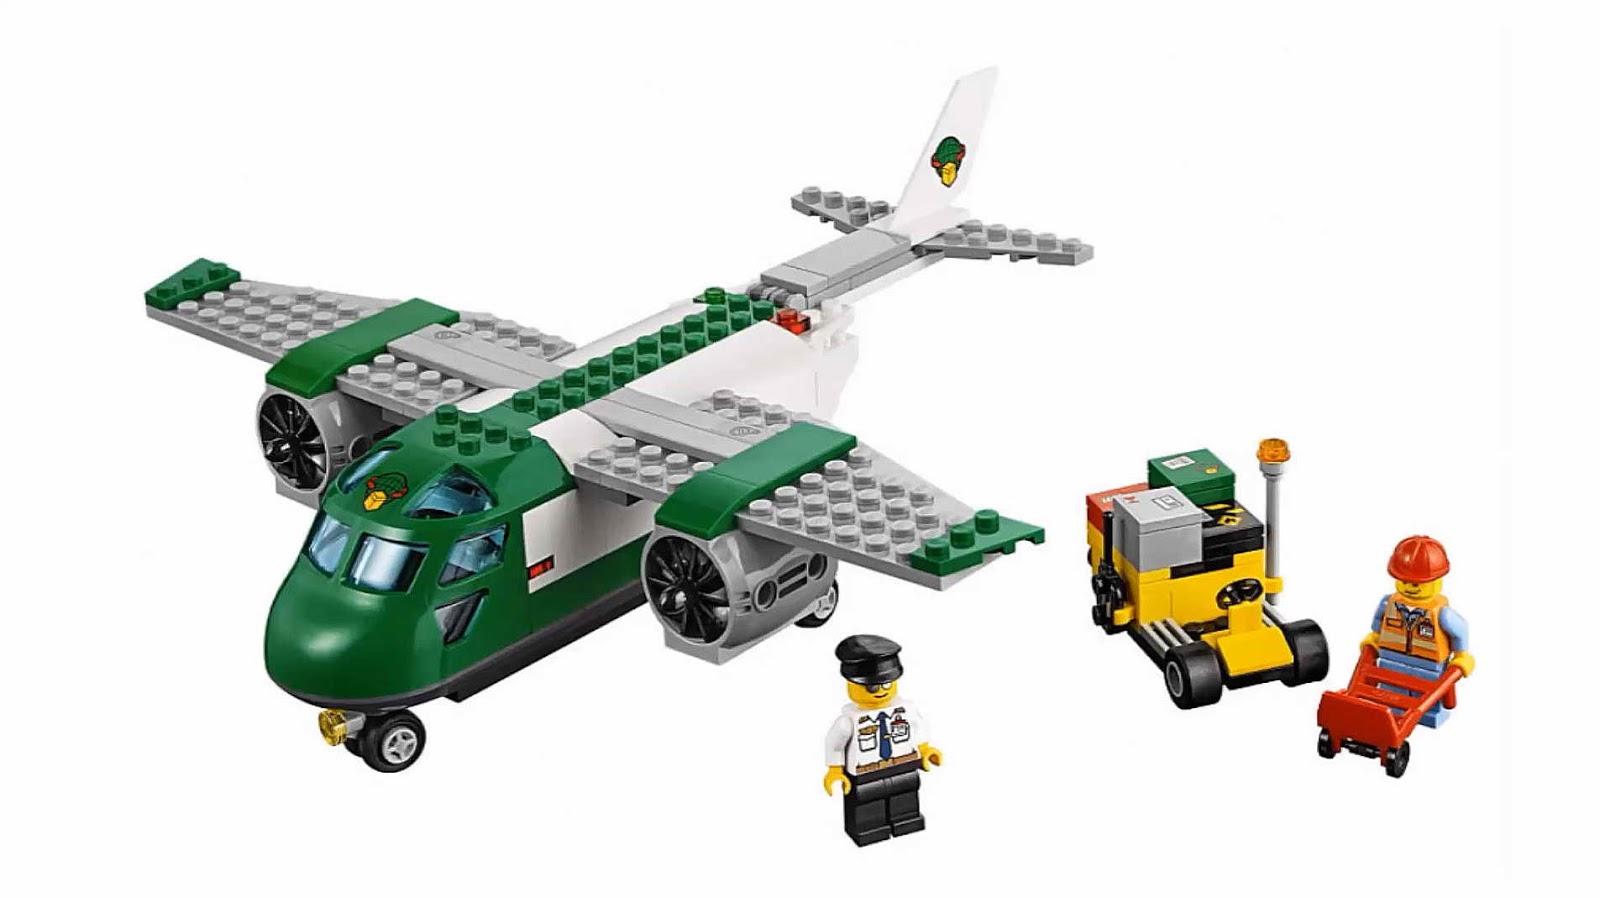 LEGO gosSIP: 130416 LEGO 60101 Airport Cargo Plane box art ...